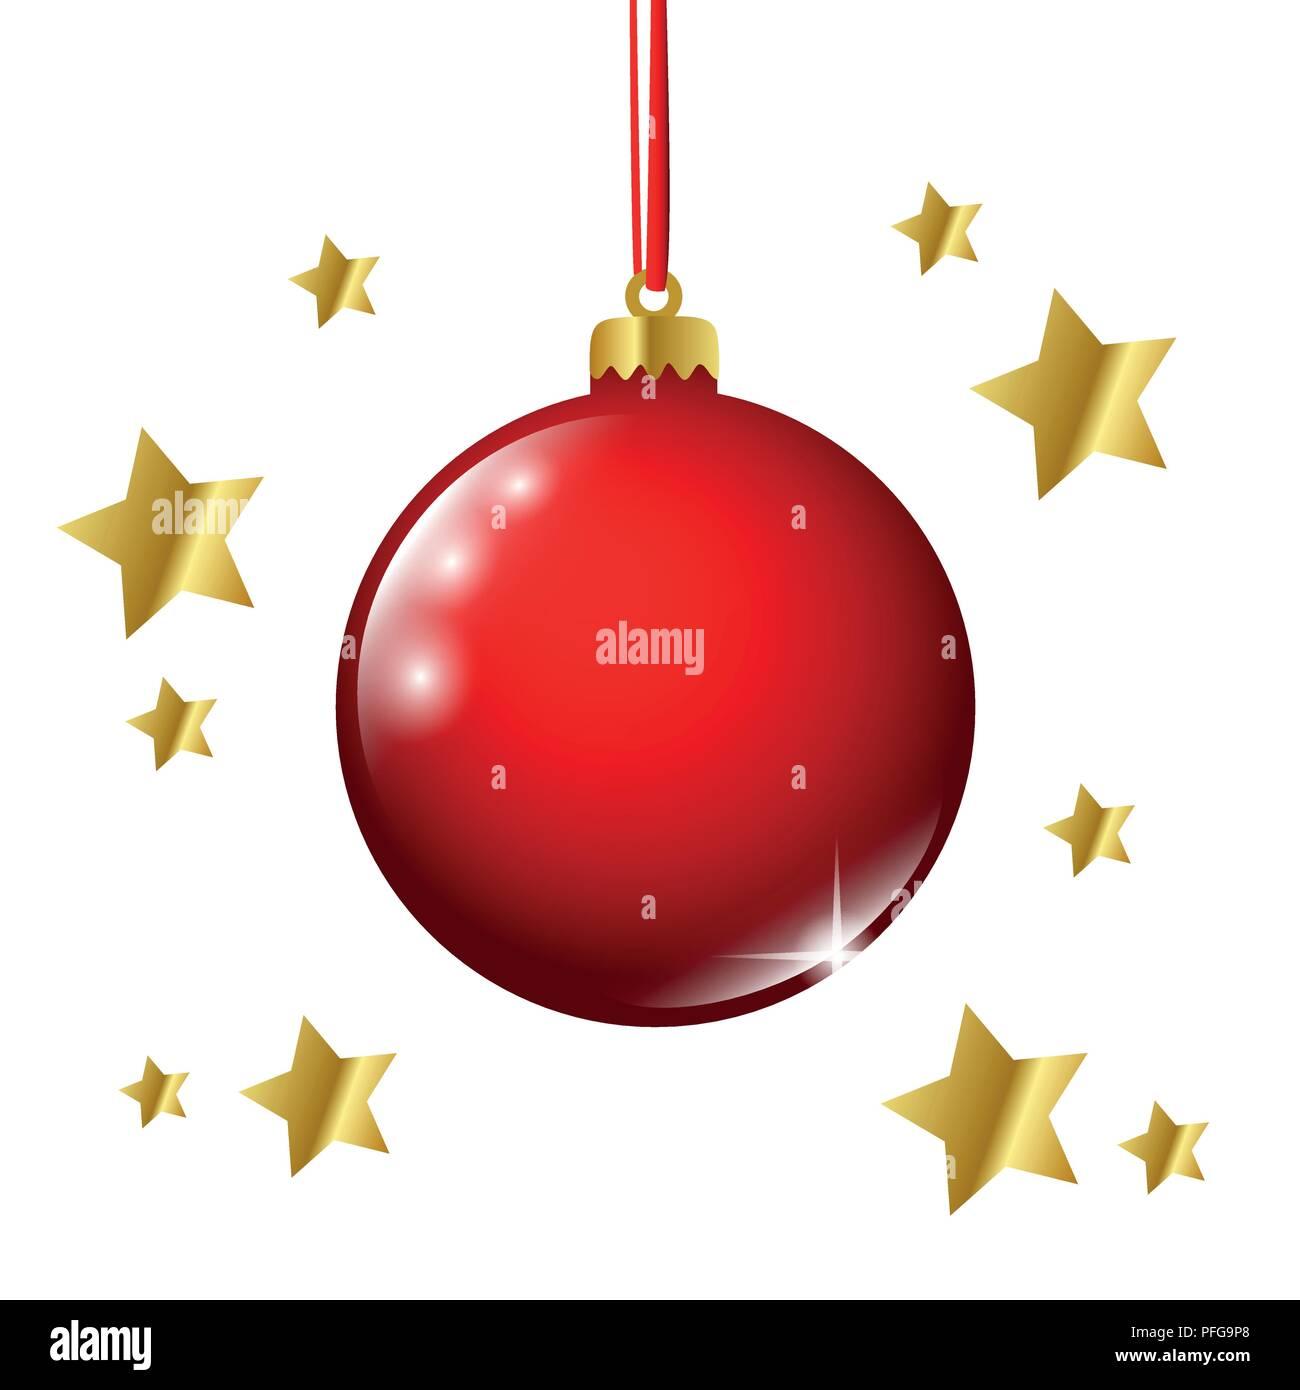 Weihnachtskugel rot gold sterne vektor illustration eps 10 vektor abbildung bild 216103168 - Weihnachtskugel englisch ...